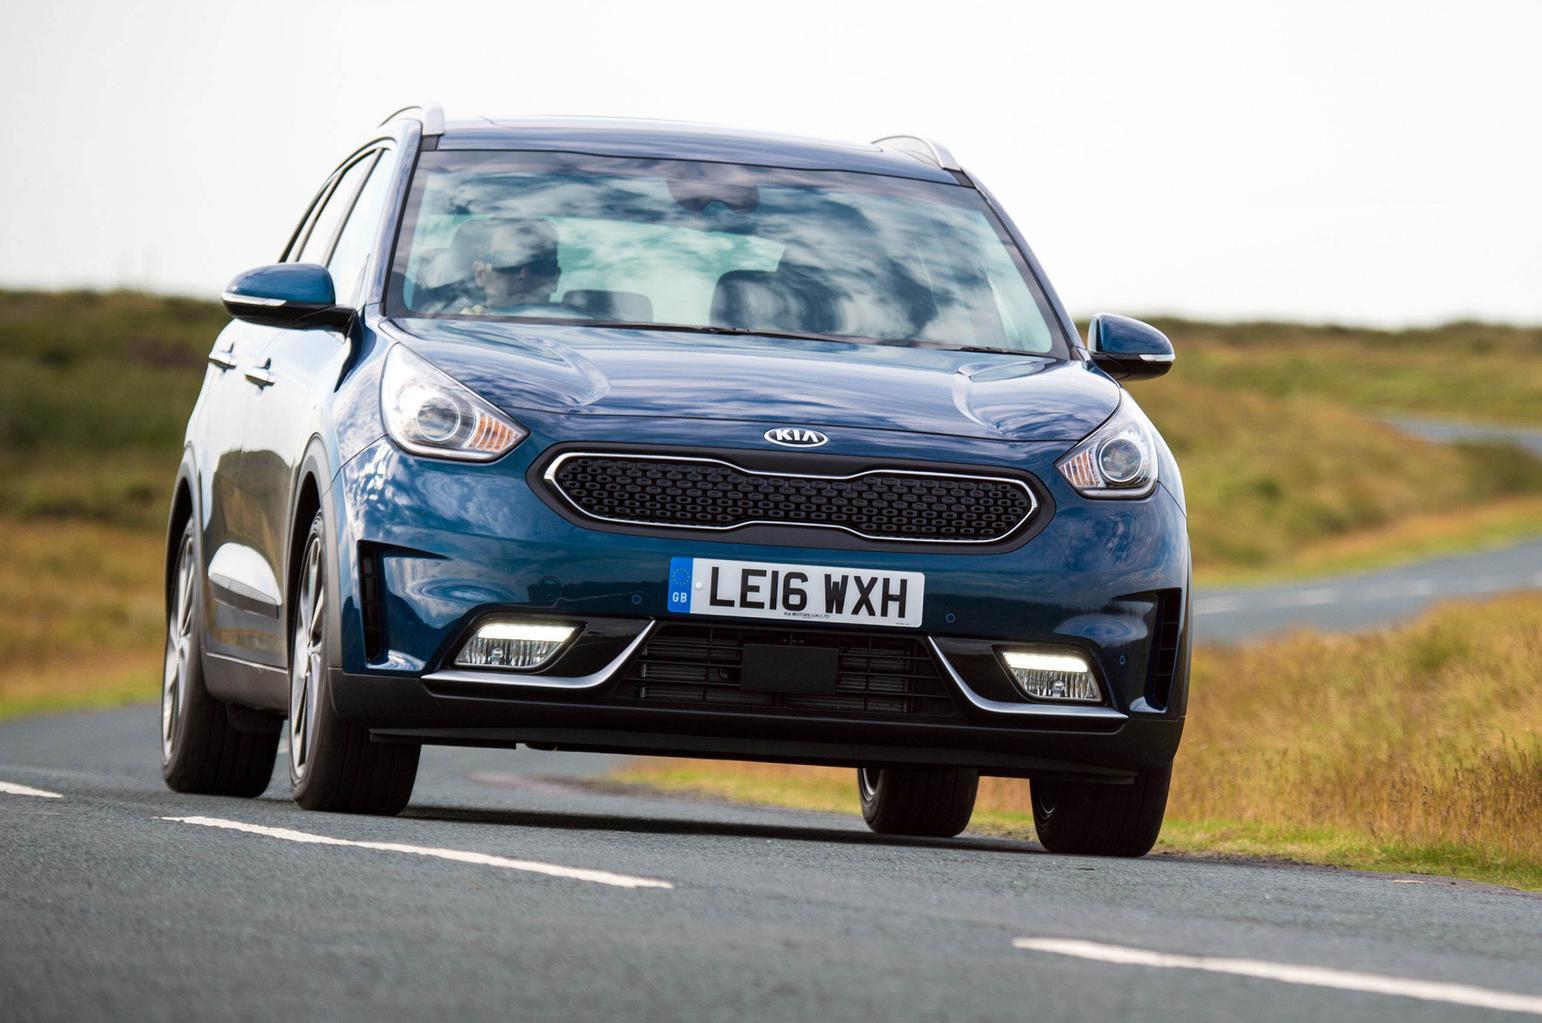 2016 Kia Niro UK review